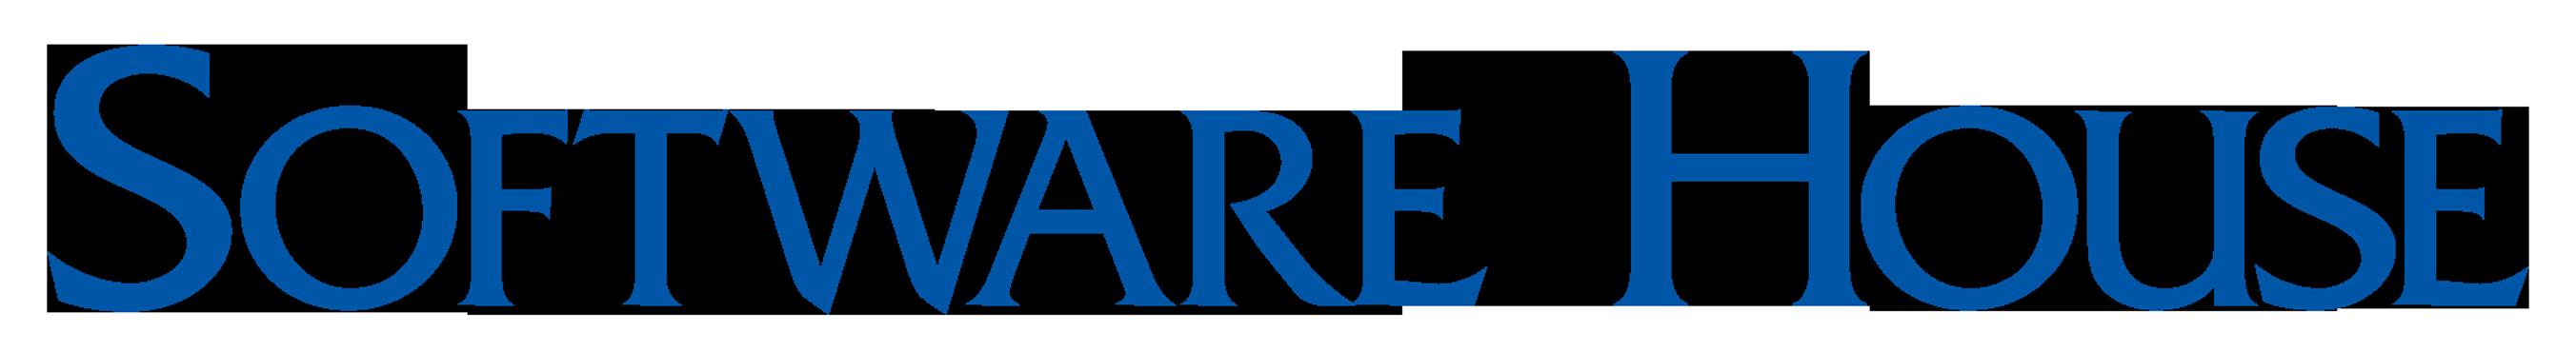 swh-lrg-no-endorsement-rgb-blue-logo